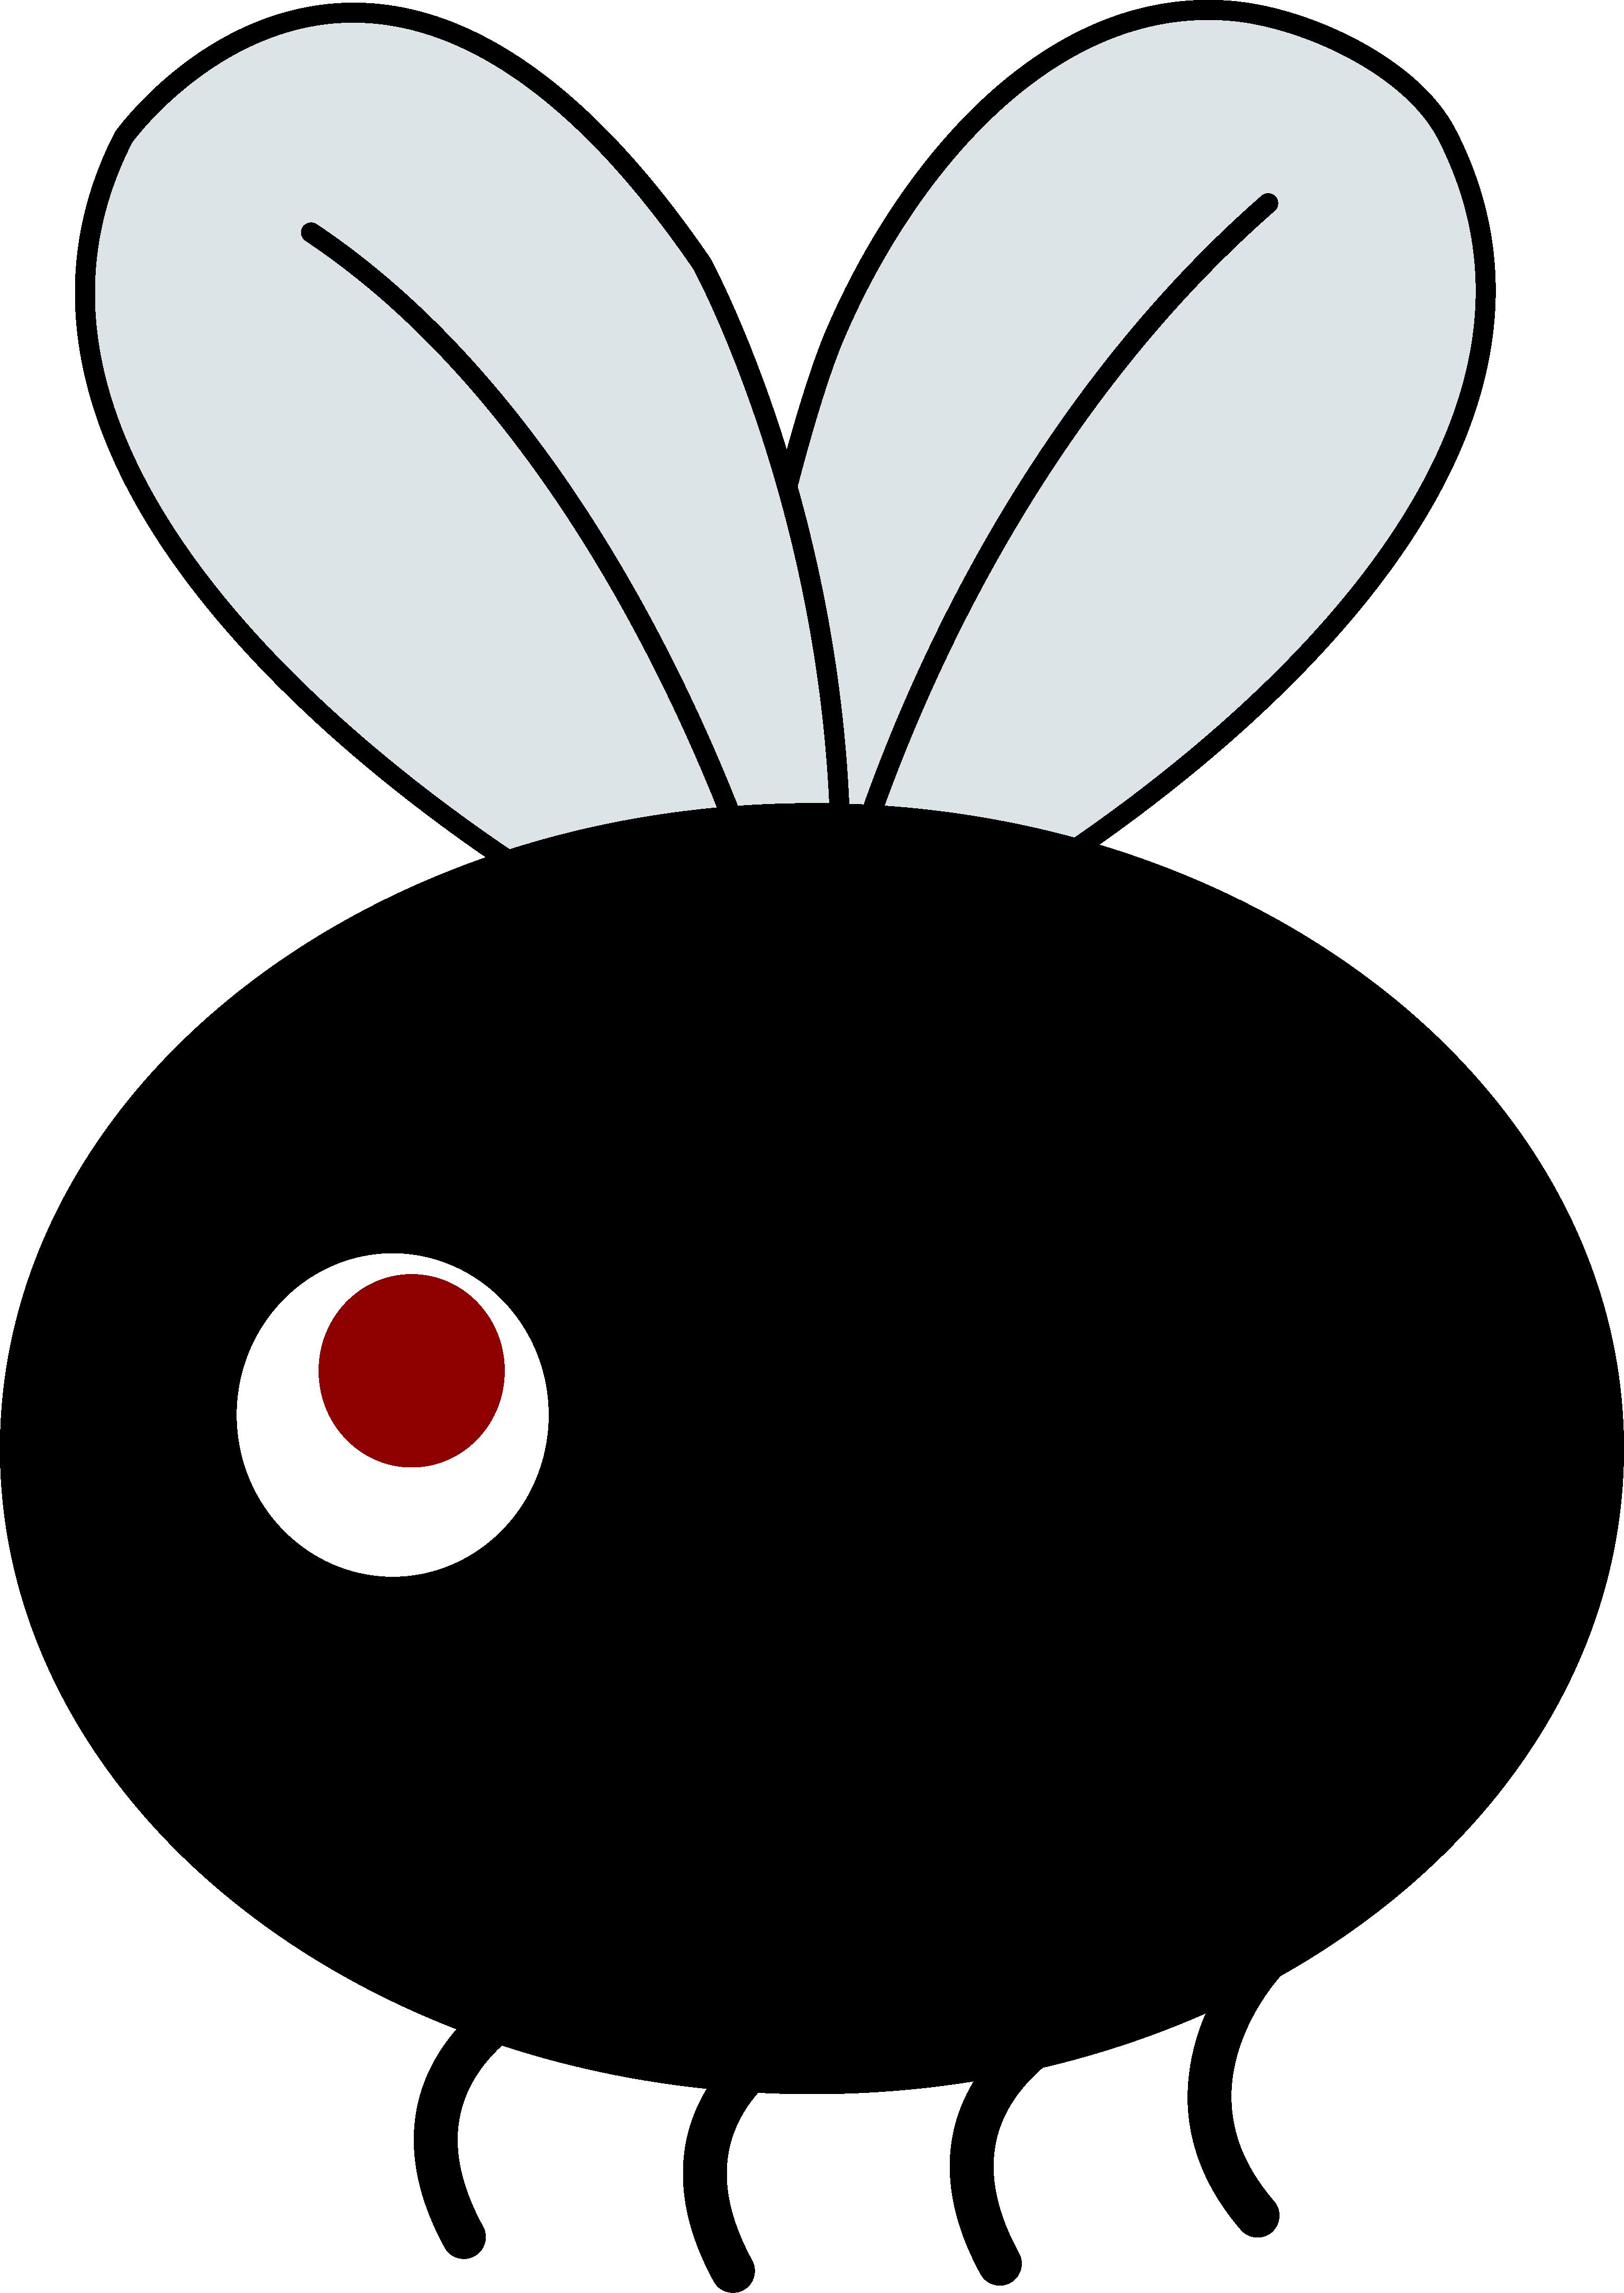 Clip Art Of Small Flies Clipart - Clipart Kid